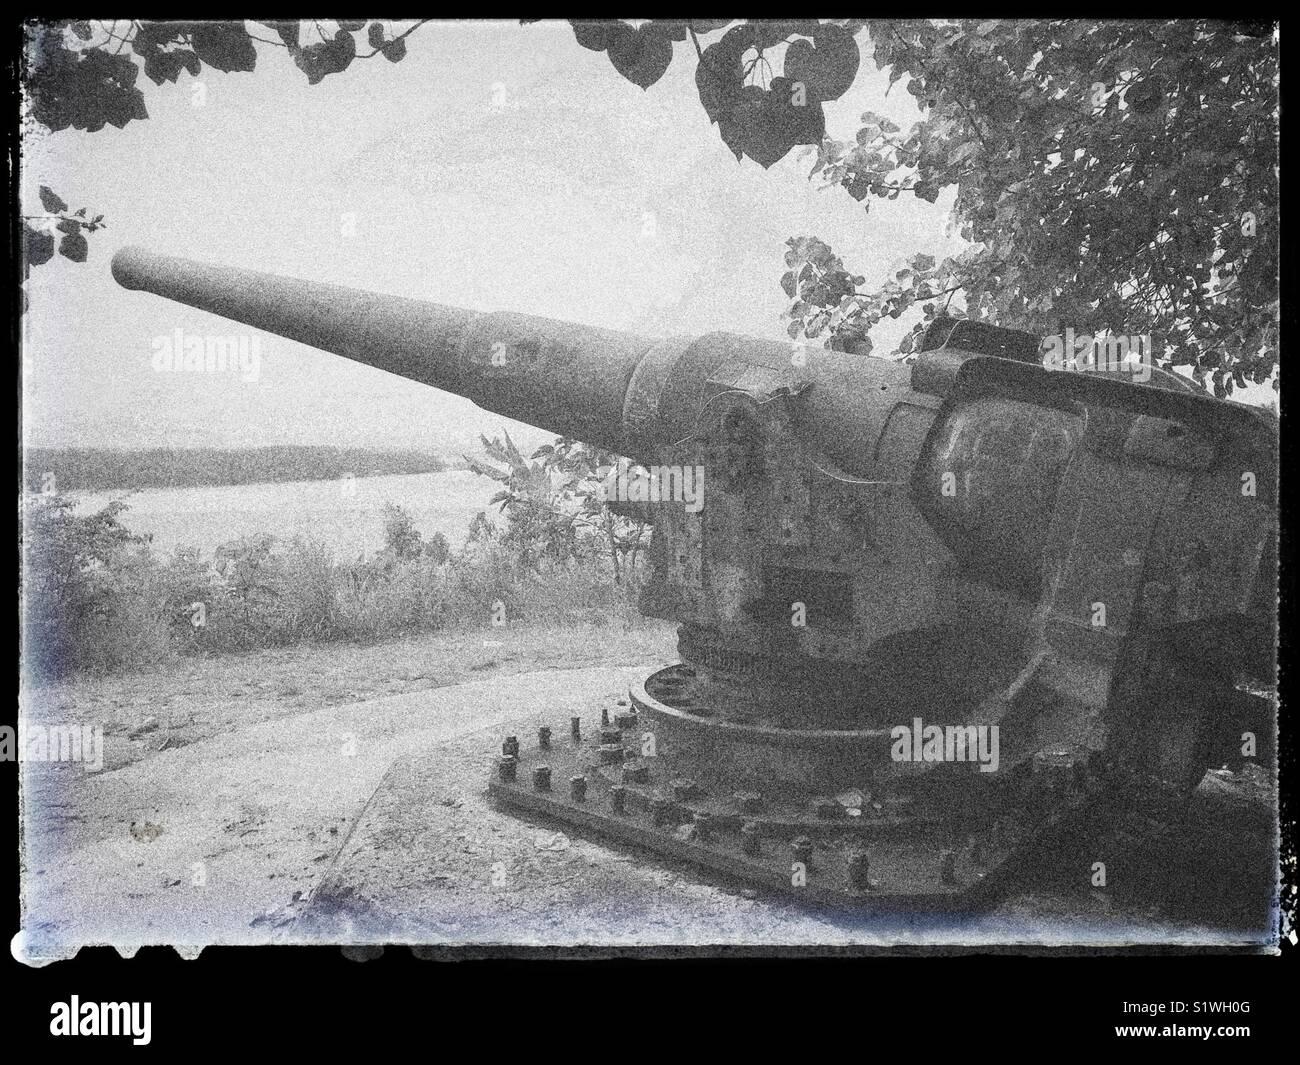 Gun From World War Ii On The Island Of French Polynesia Bora Bora